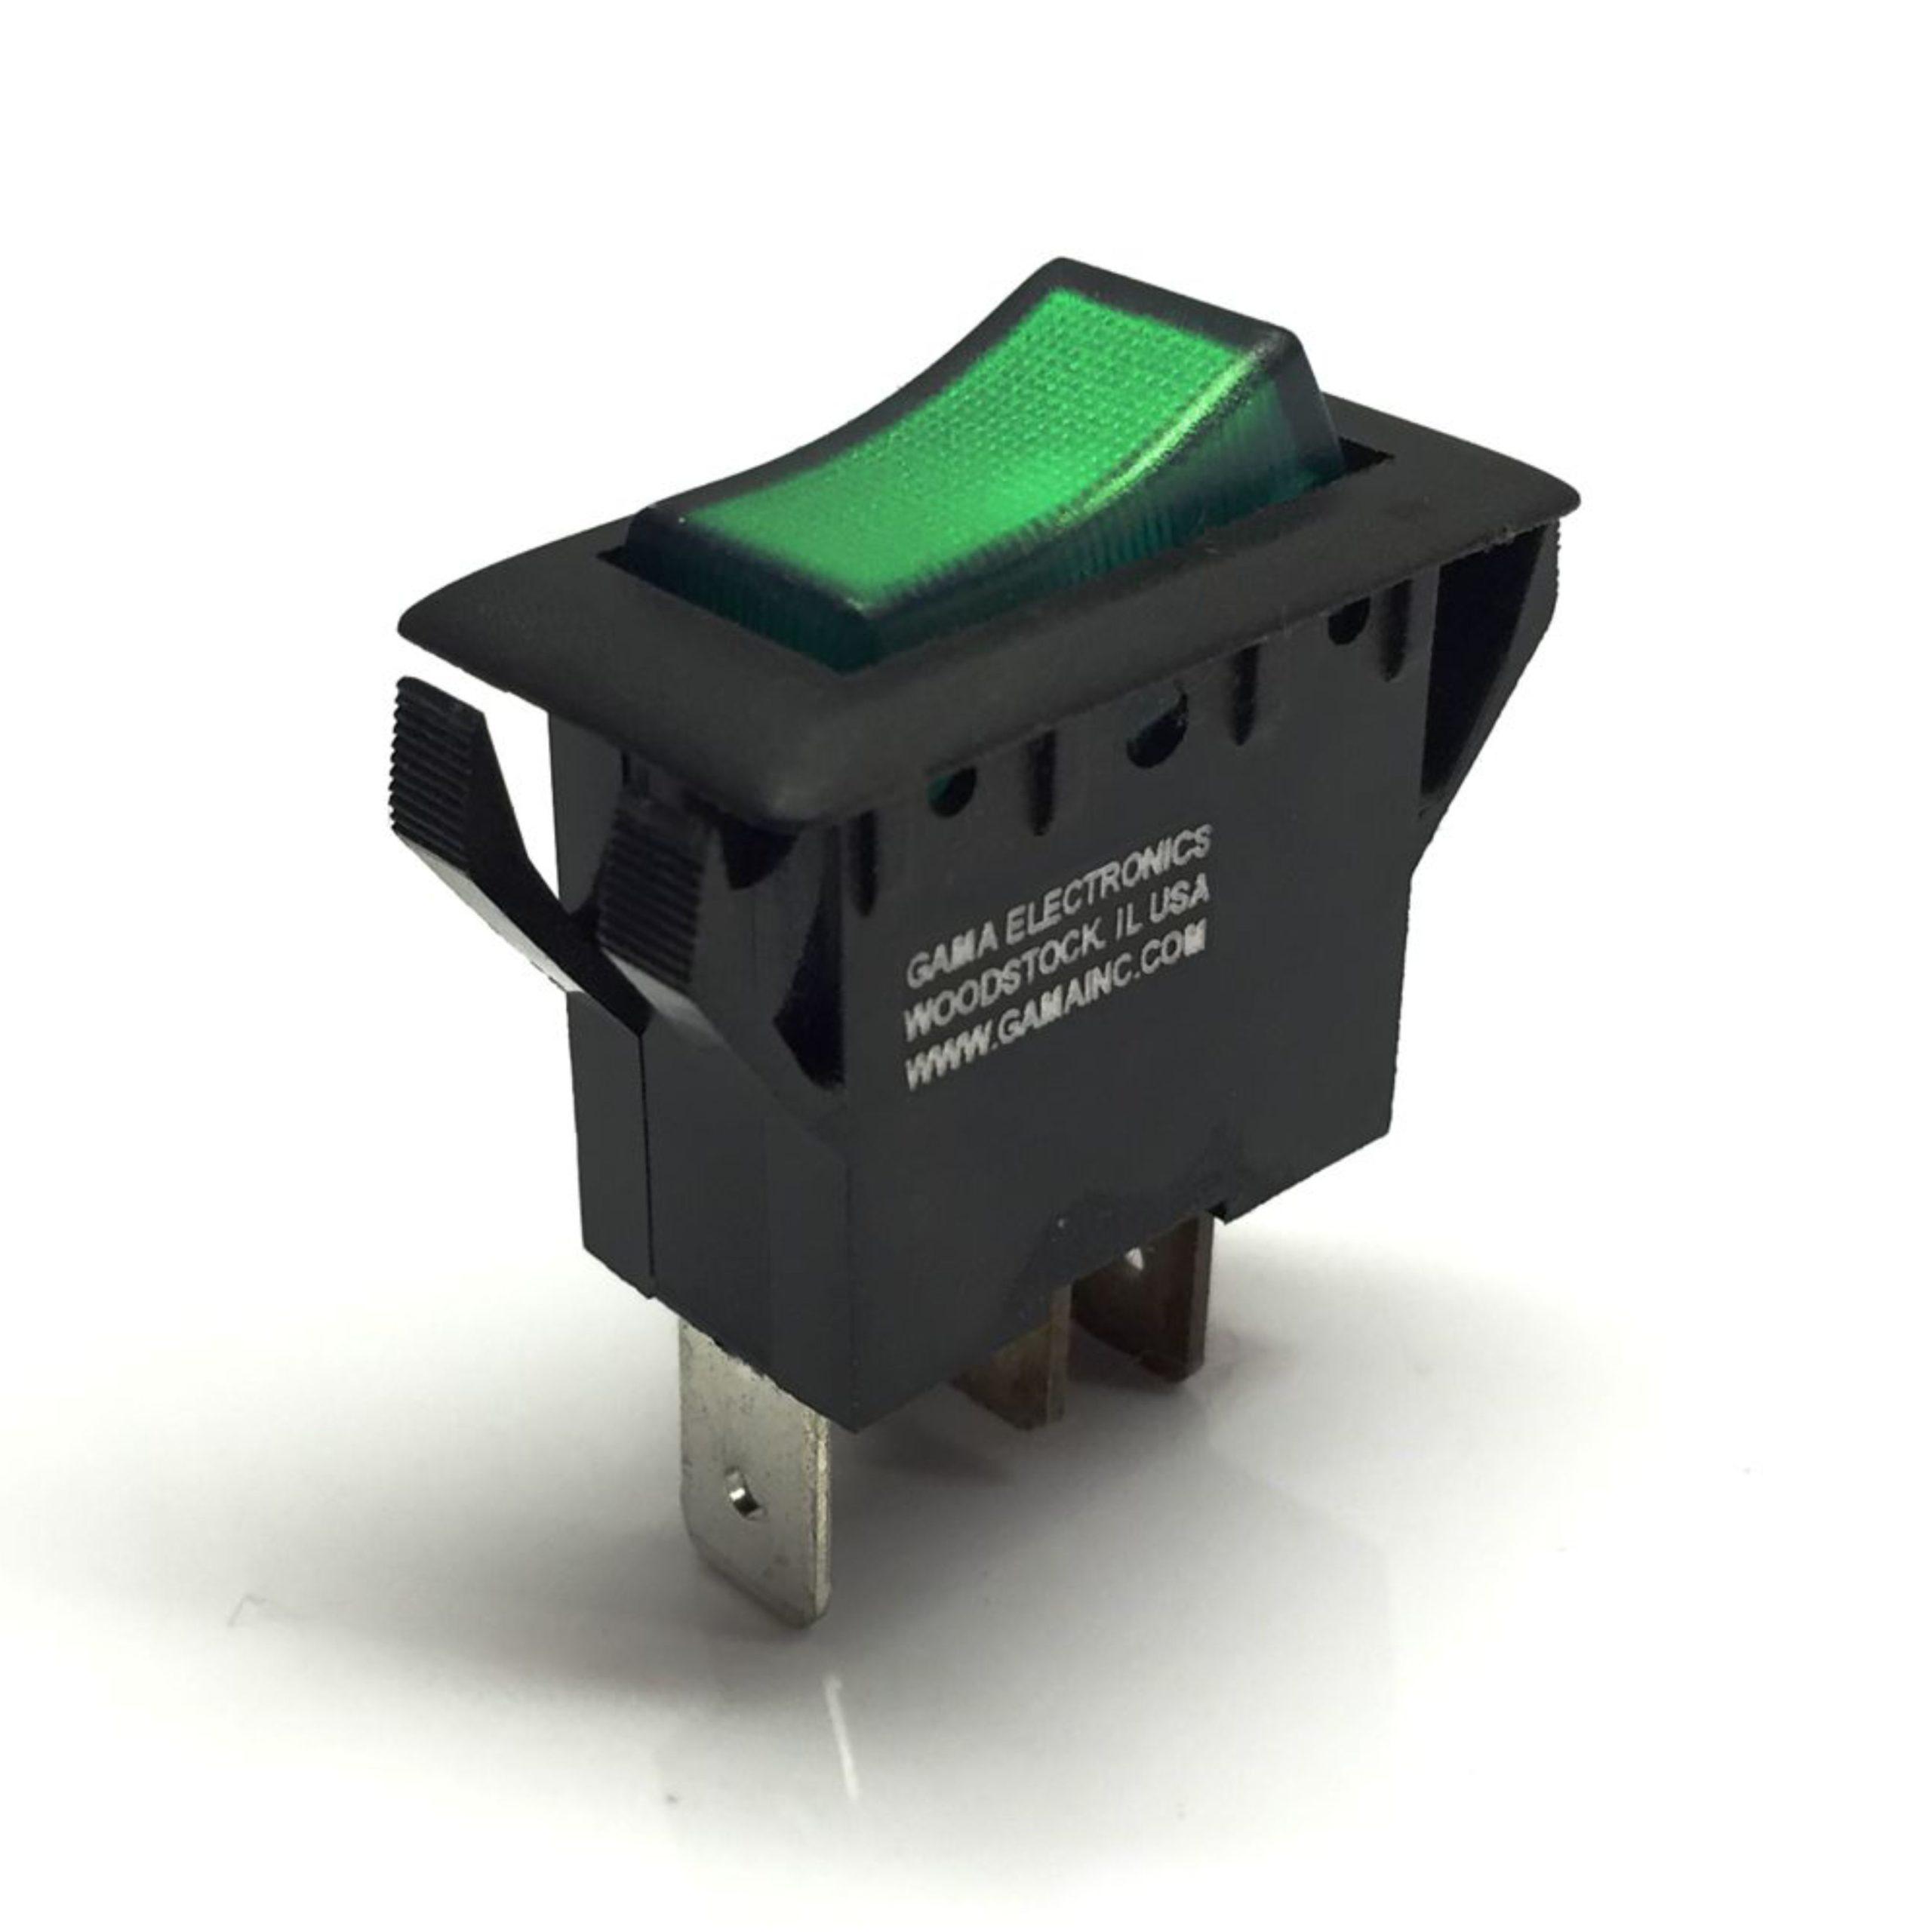 Switch Wiring Diagram Also Rocker Switch Wiring Diagram On Dc Rocker